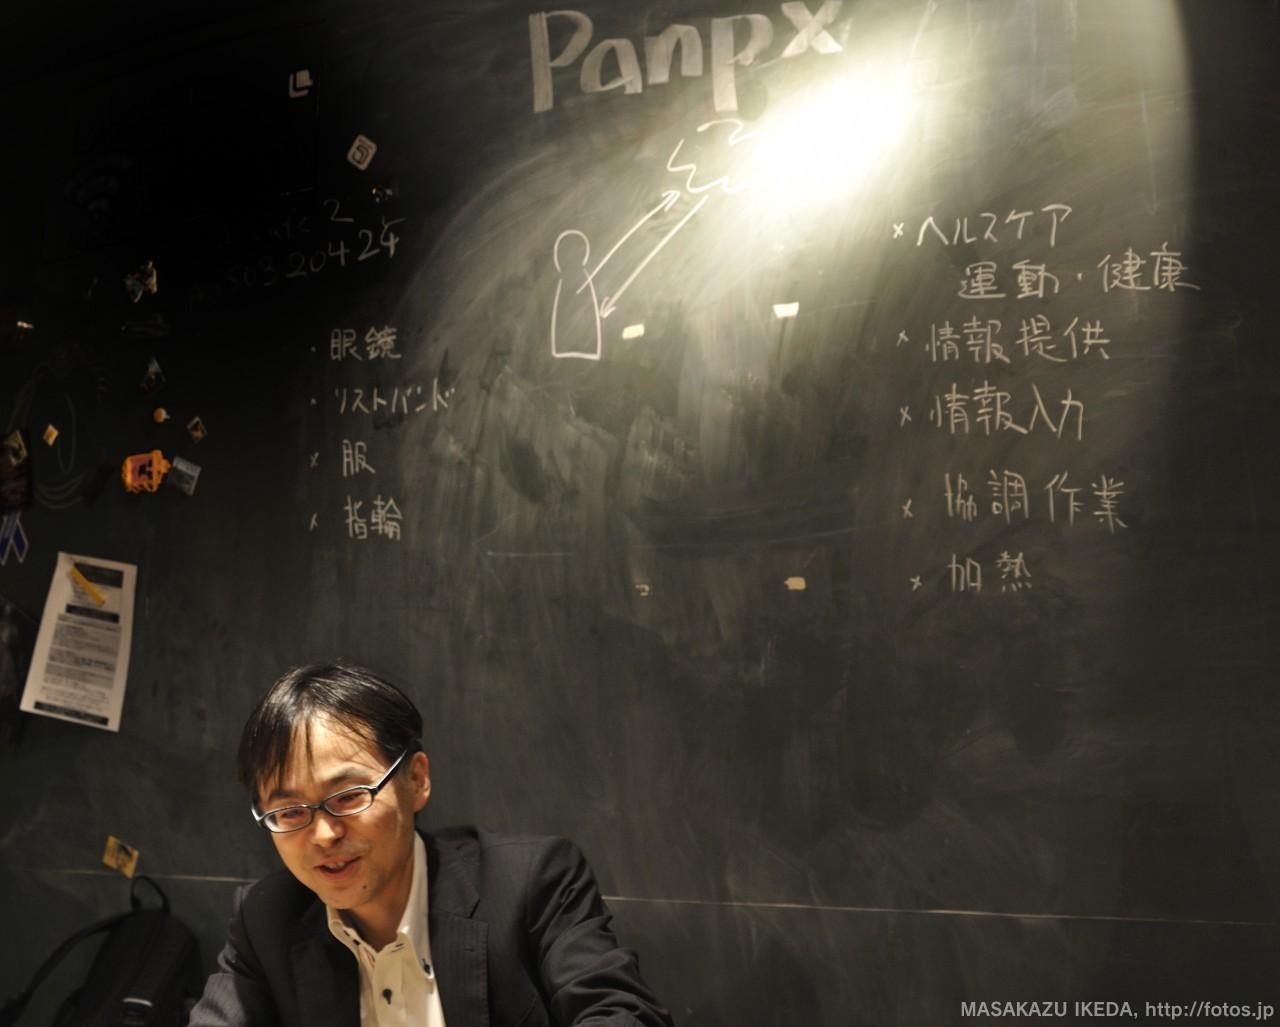 Panpx 主催・モデレーター内田友幸氏